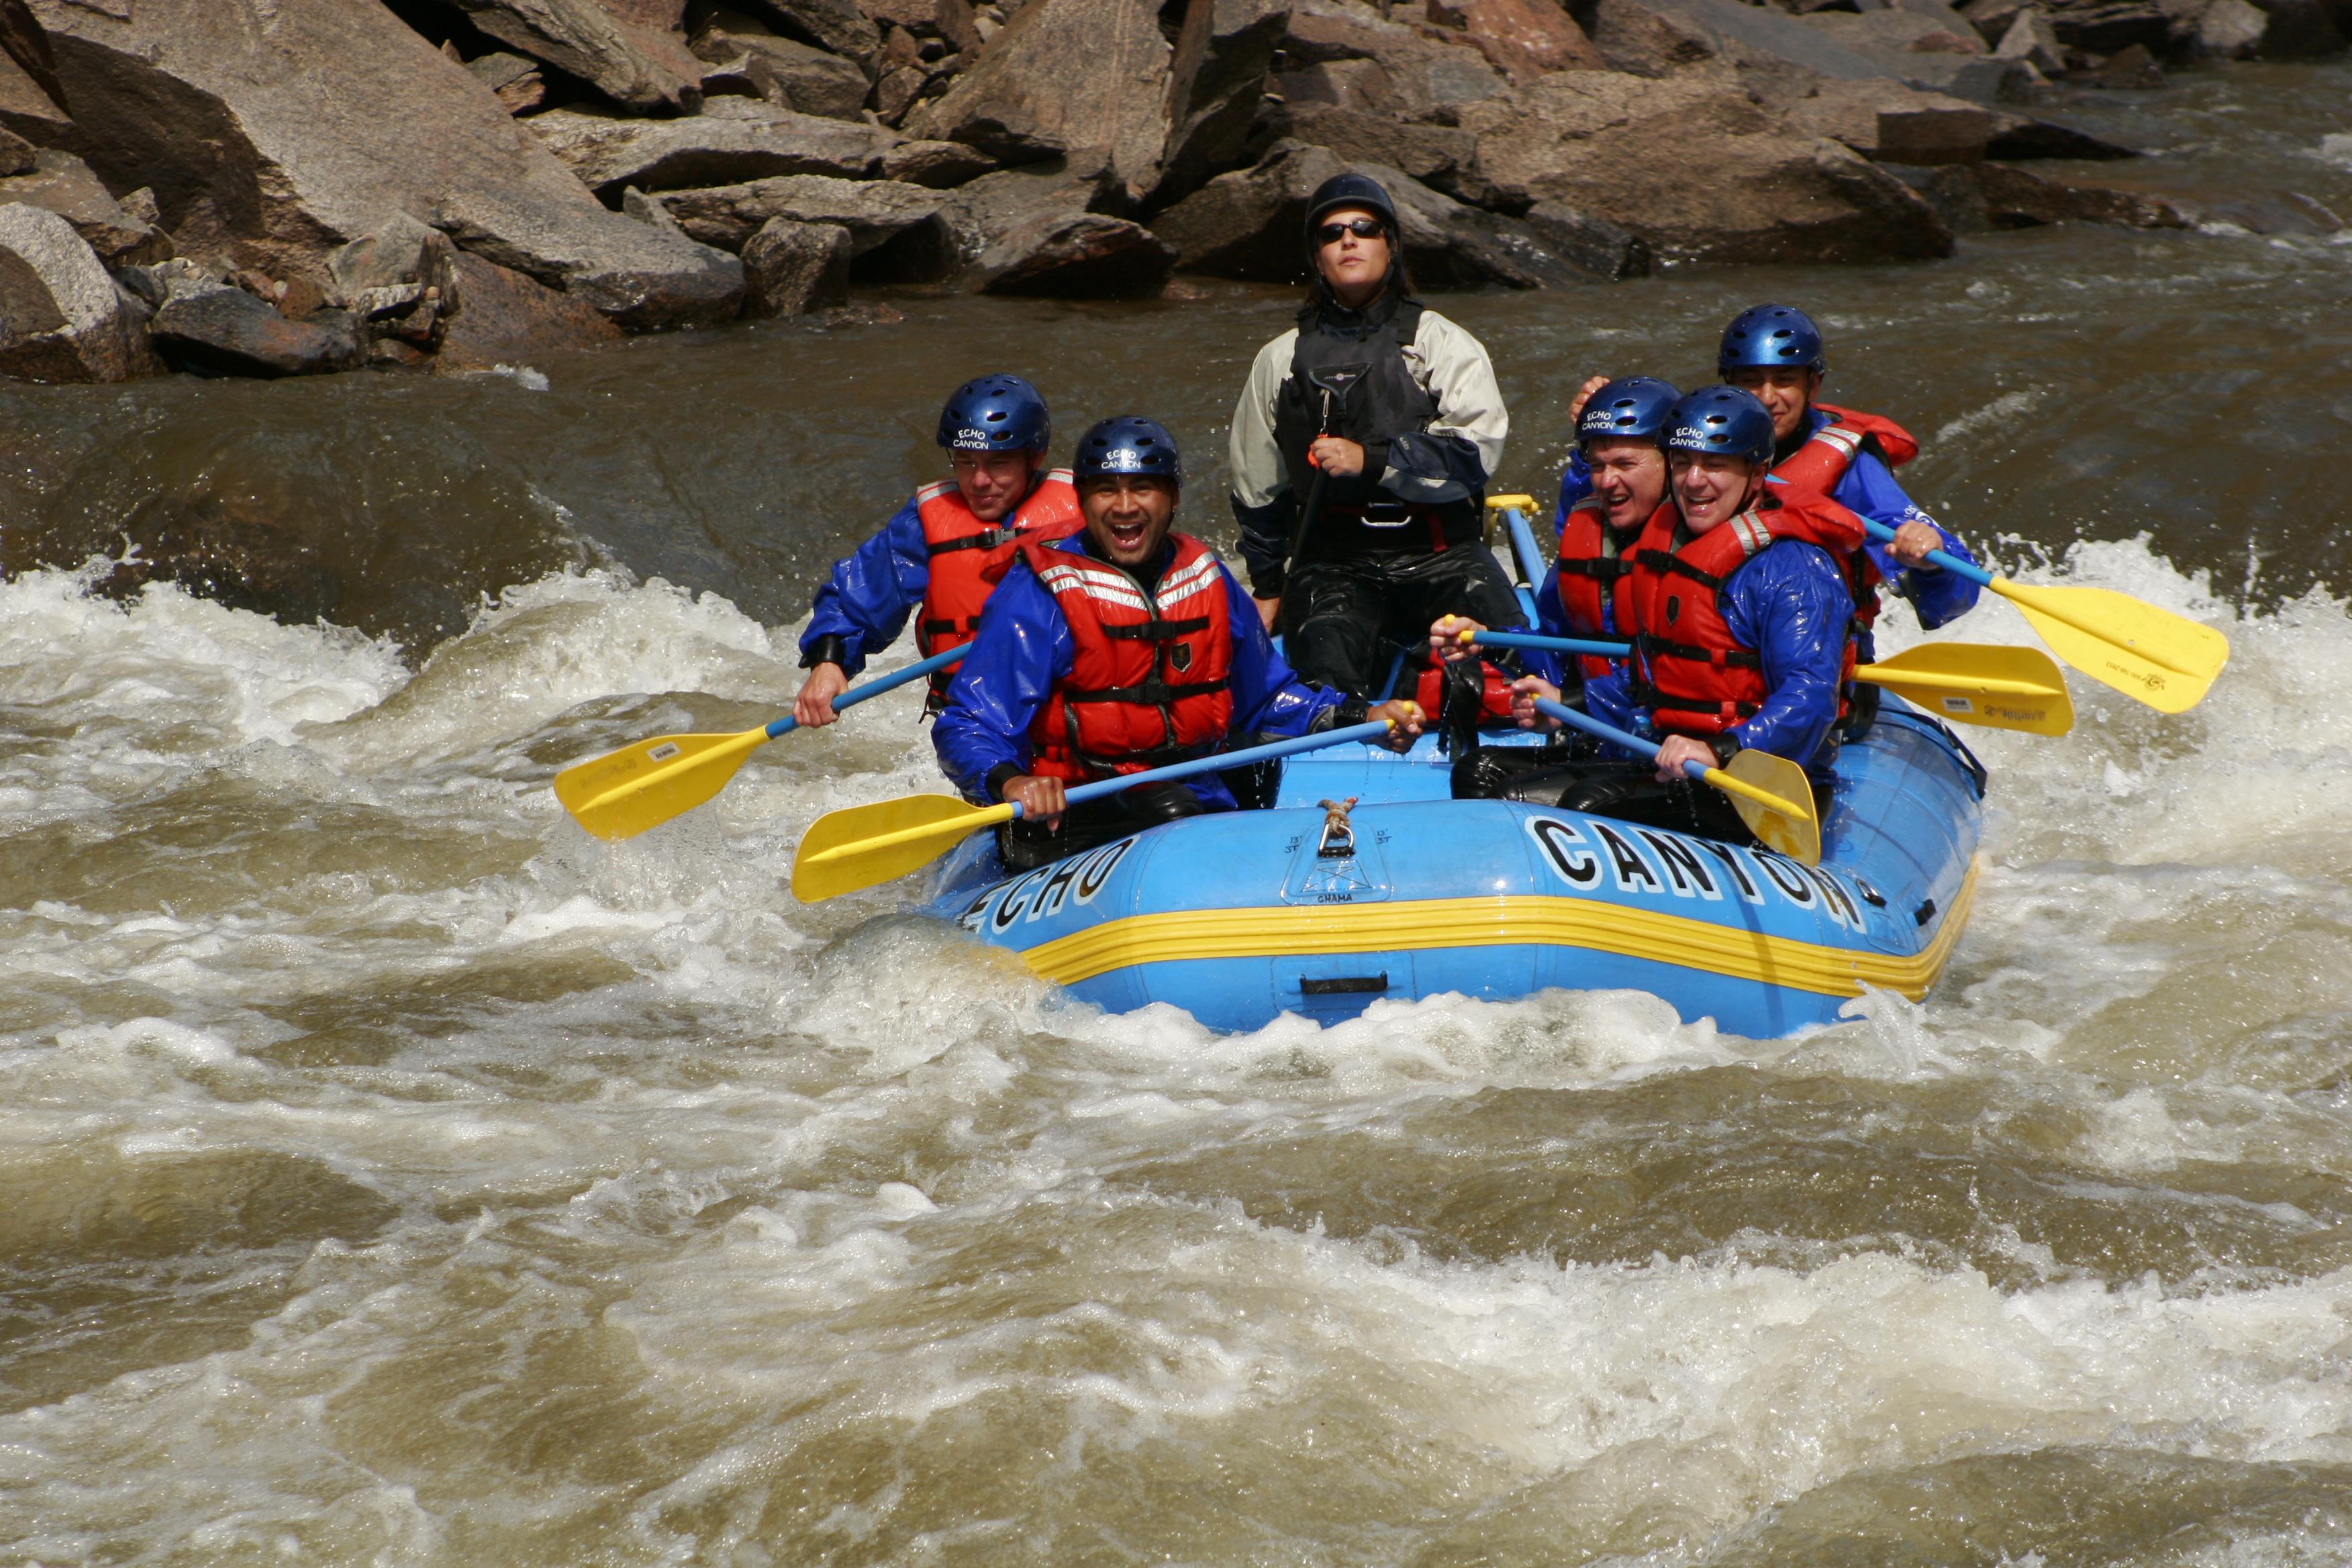 Photo: Rafting Arkansas River Royal Gorge